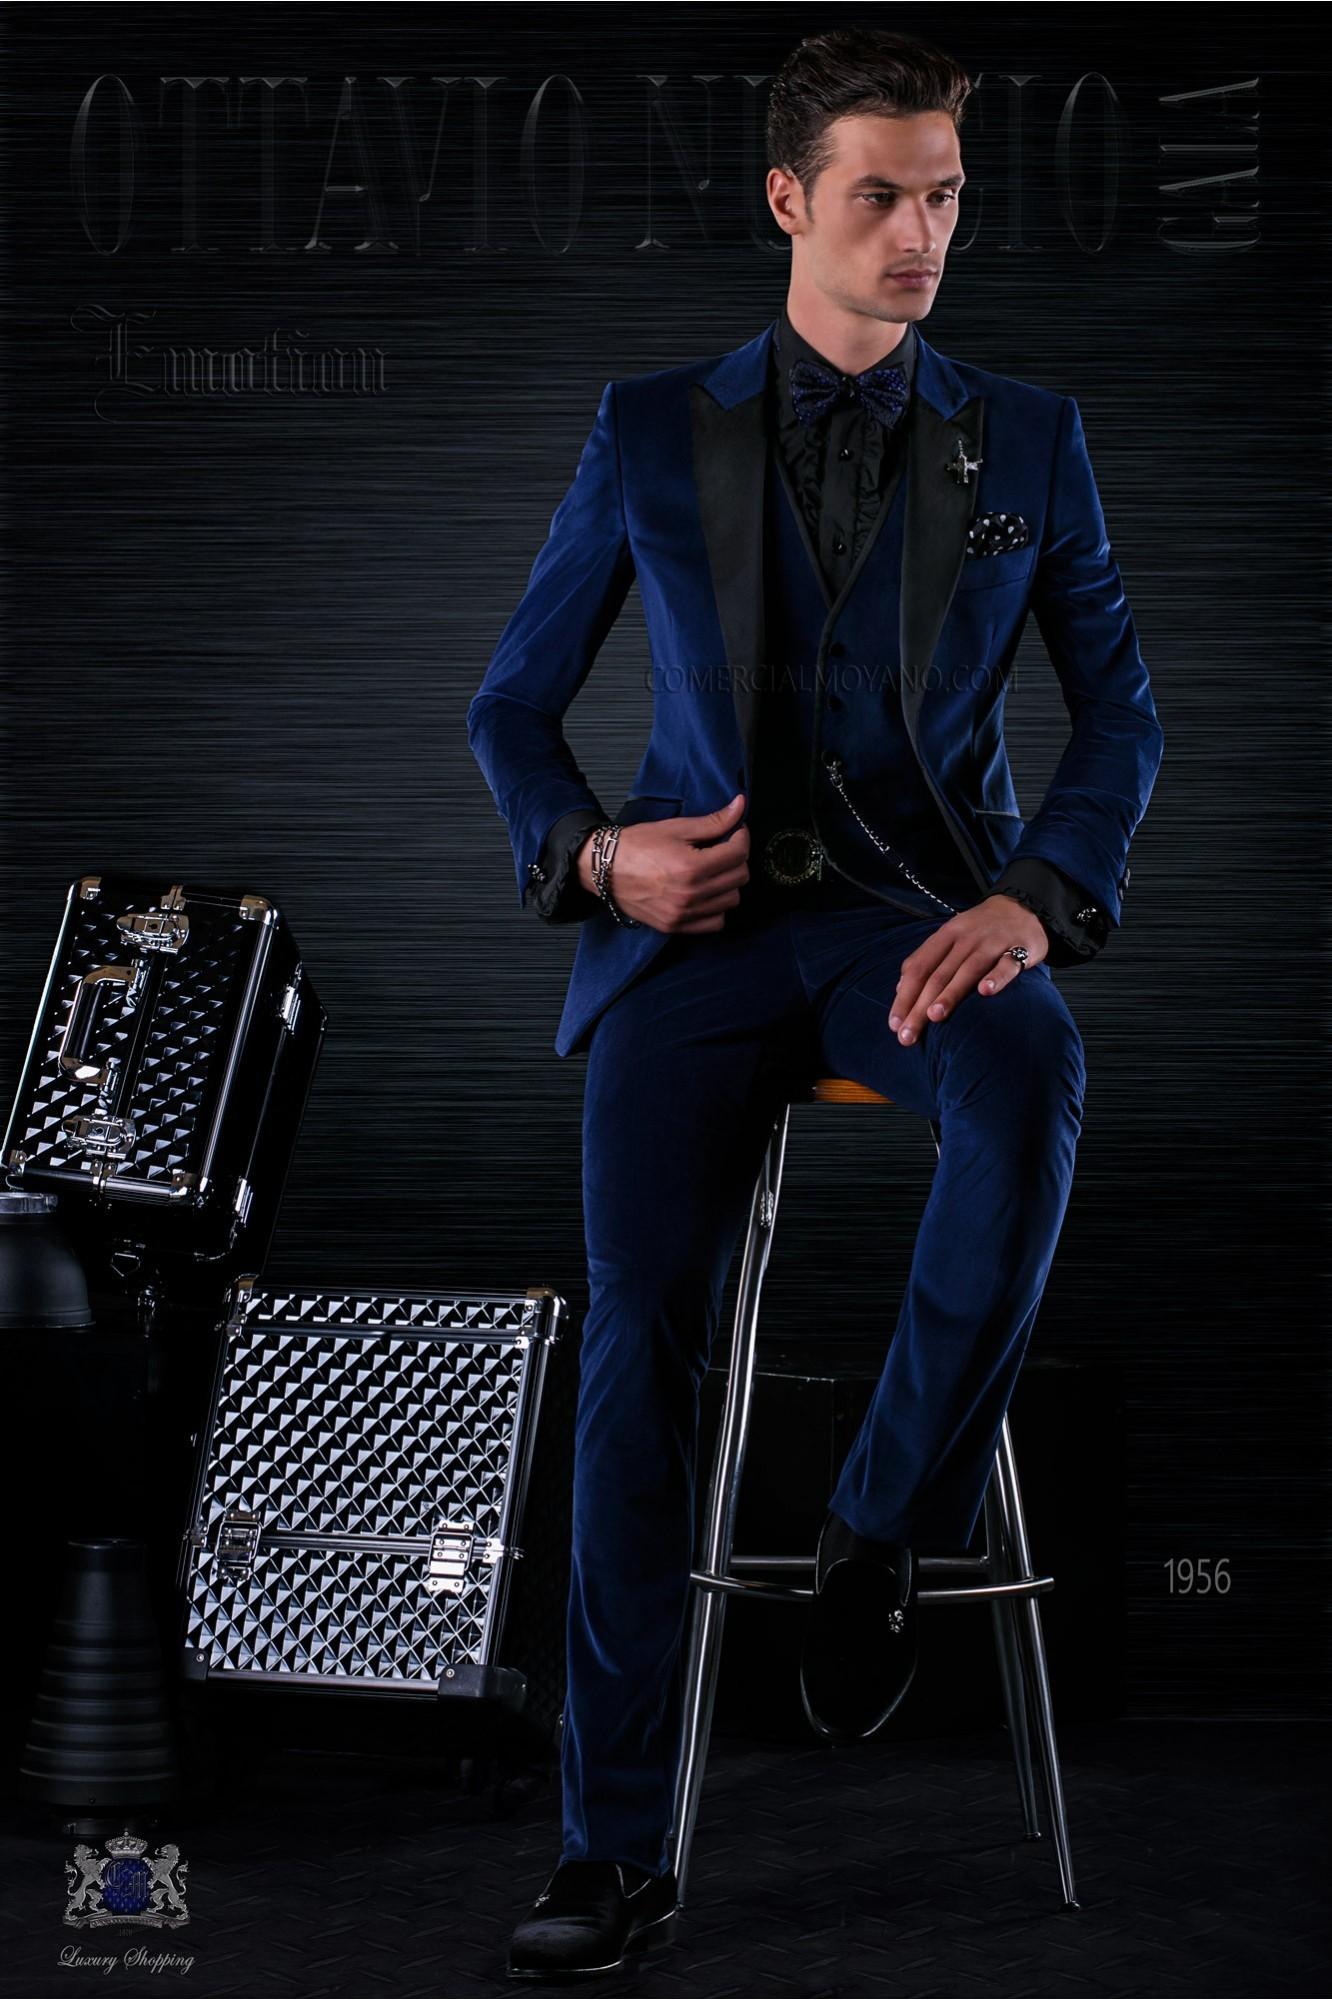 Traje de moda a medida italiano azul de terciopelo modelo: 1956 Ottavio Nuccio Gala colección Emotion